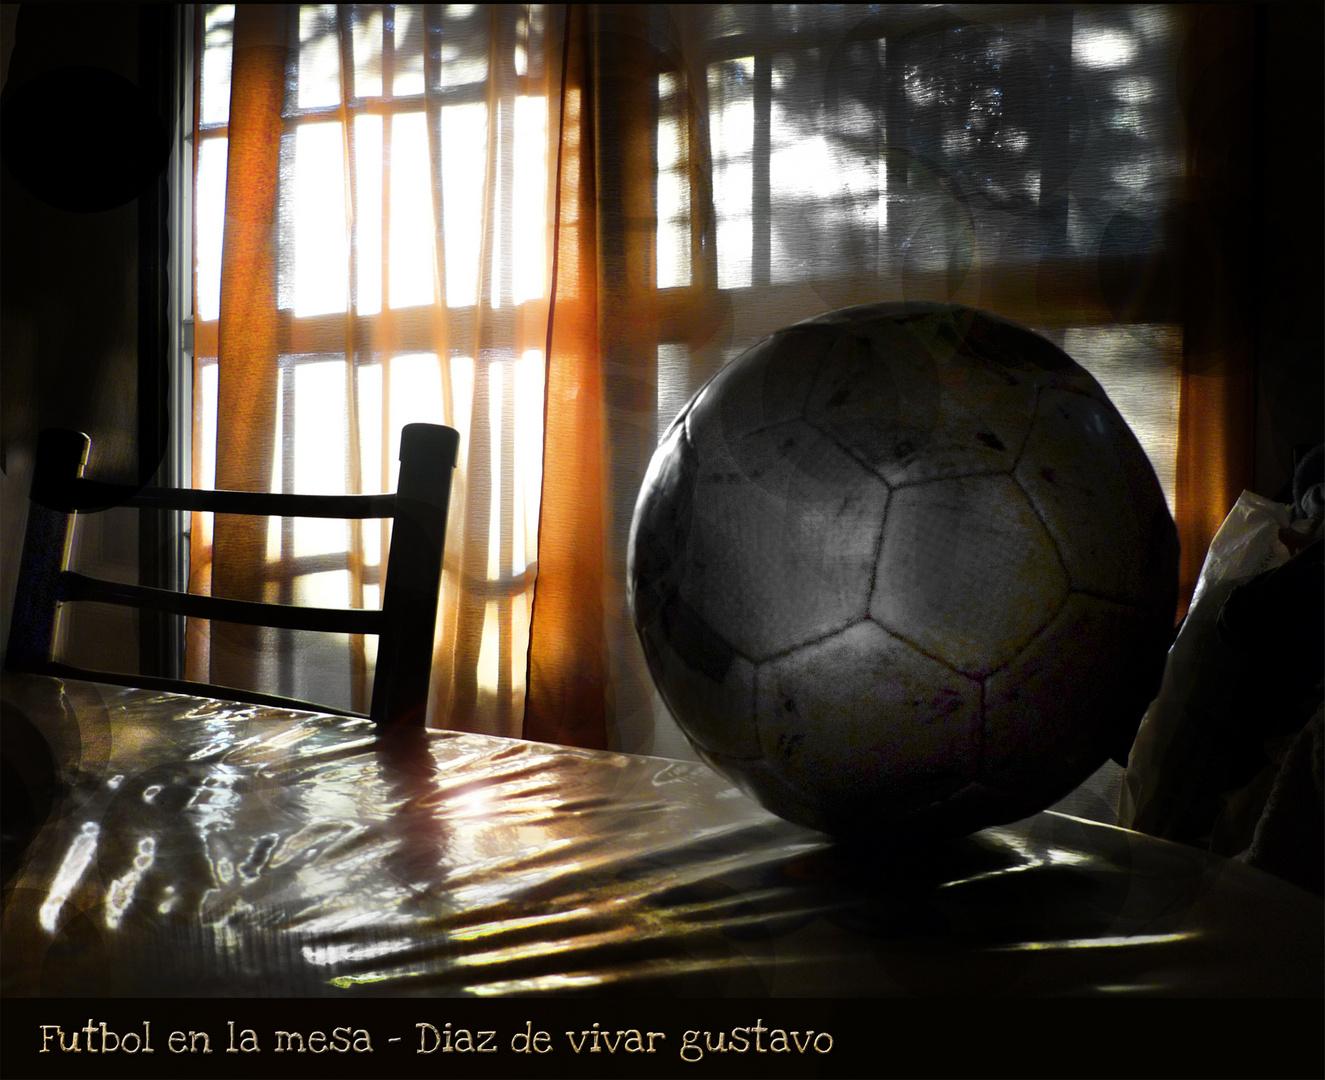 Futbol en la mesa